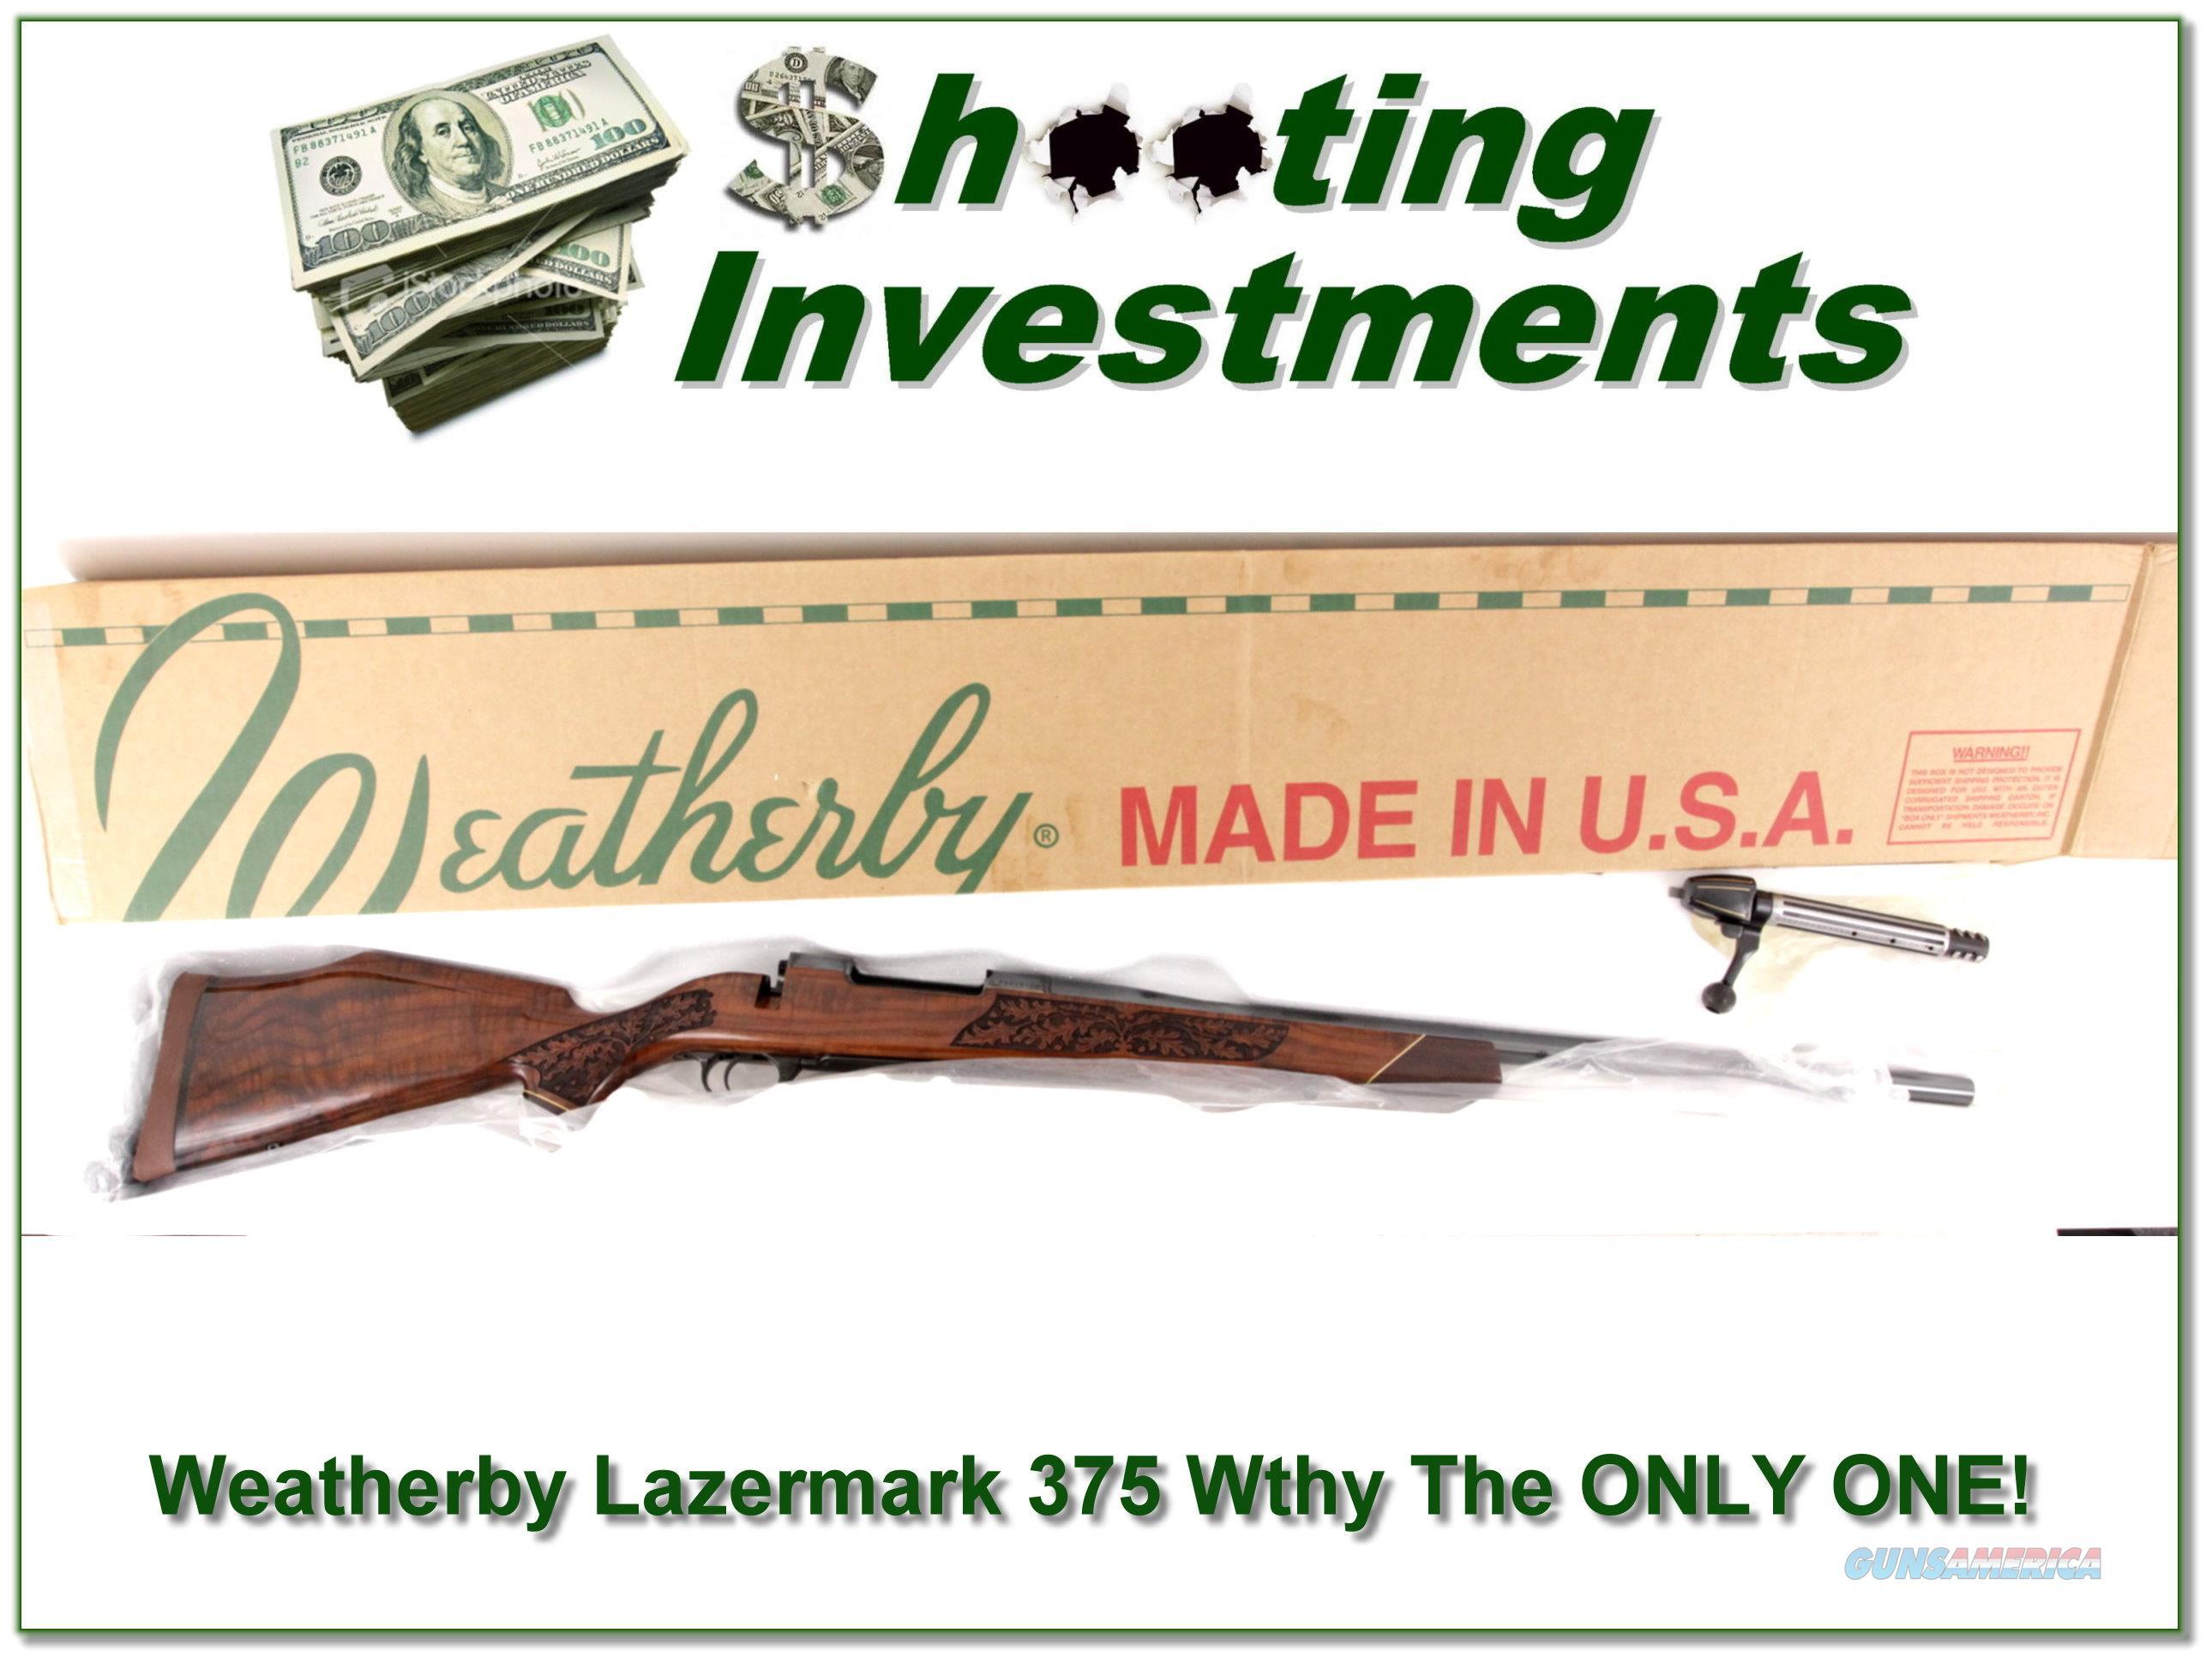 Weatherby Custom Shop 375 Wthy Lazermark  Guns > Rifles > Weatherby Rifles > Sporting